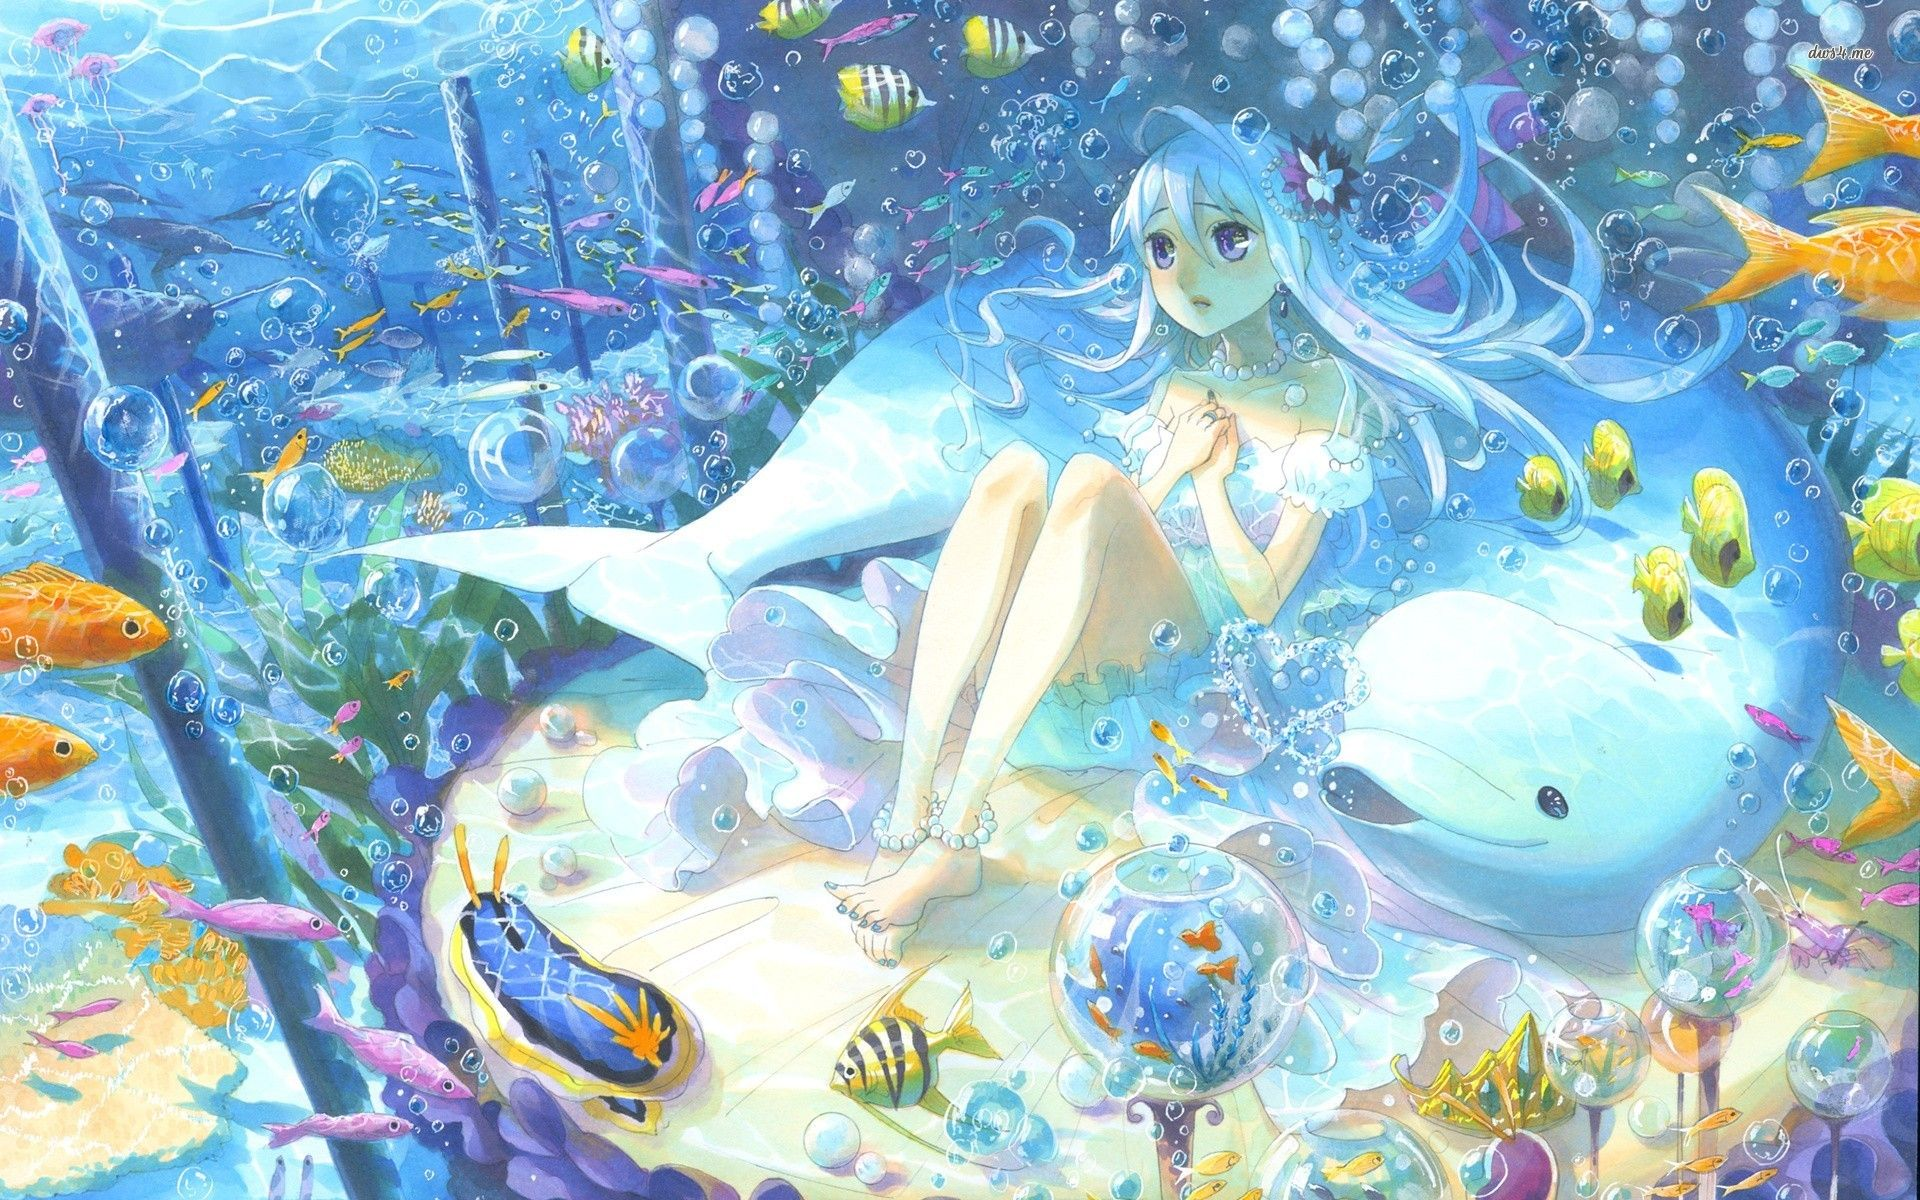 Anime Mermaid Hd Wallpaper Anime Mermaid Aesthetic Anime Anime Images